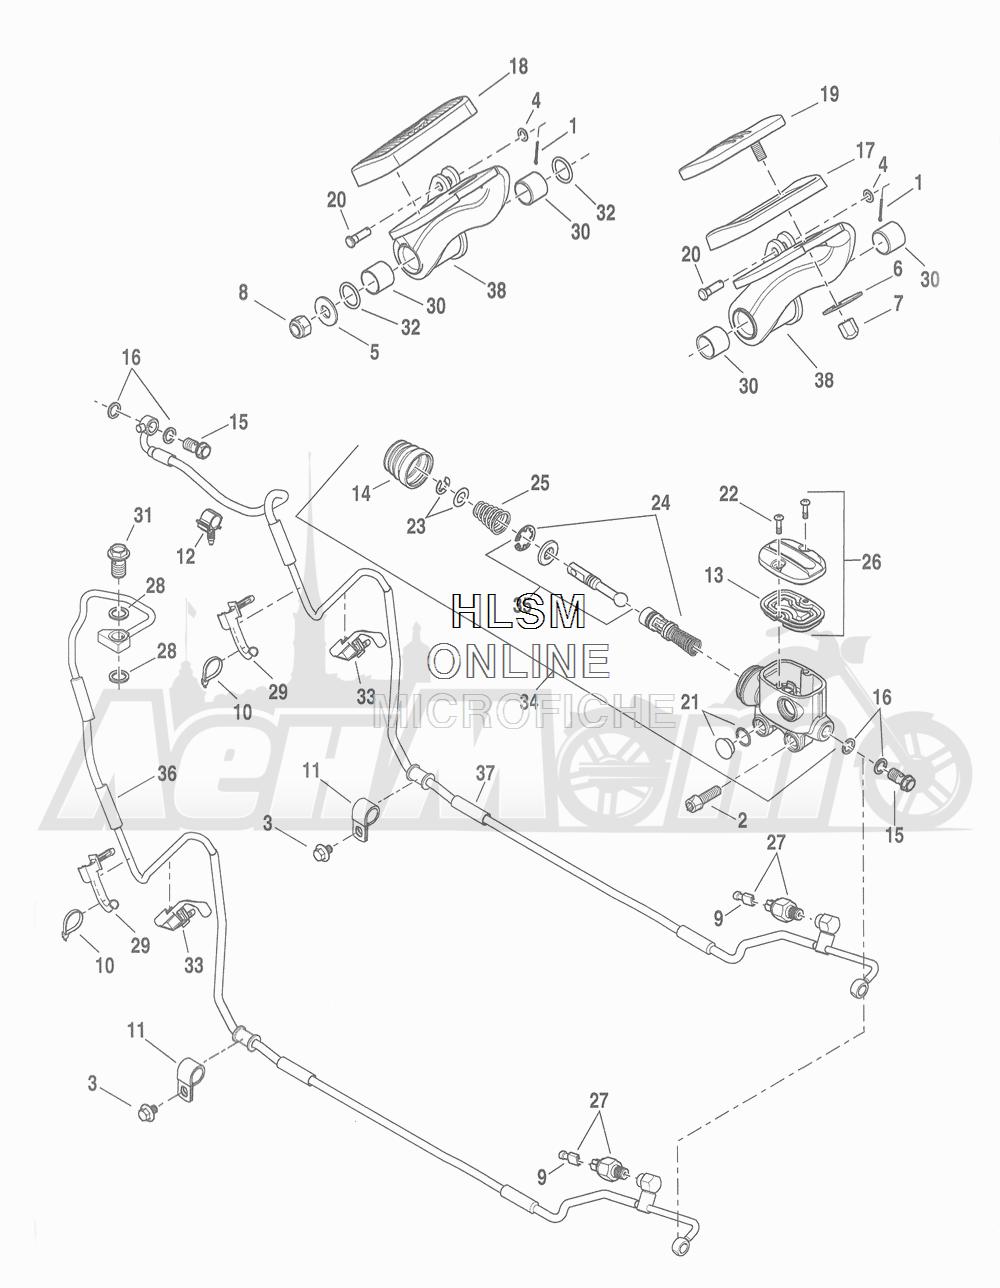 Запчасти для Мотоцикла Harley-Davidson 2016 FLHTCU TC ELECTRA GLIDE ULTRA CLASSIC (KSL) Раздел: BRAKE - REAR BRAKE CYLINDER W/ PEDAL | задний тормоз тормоза цилиндр вместе с педаль